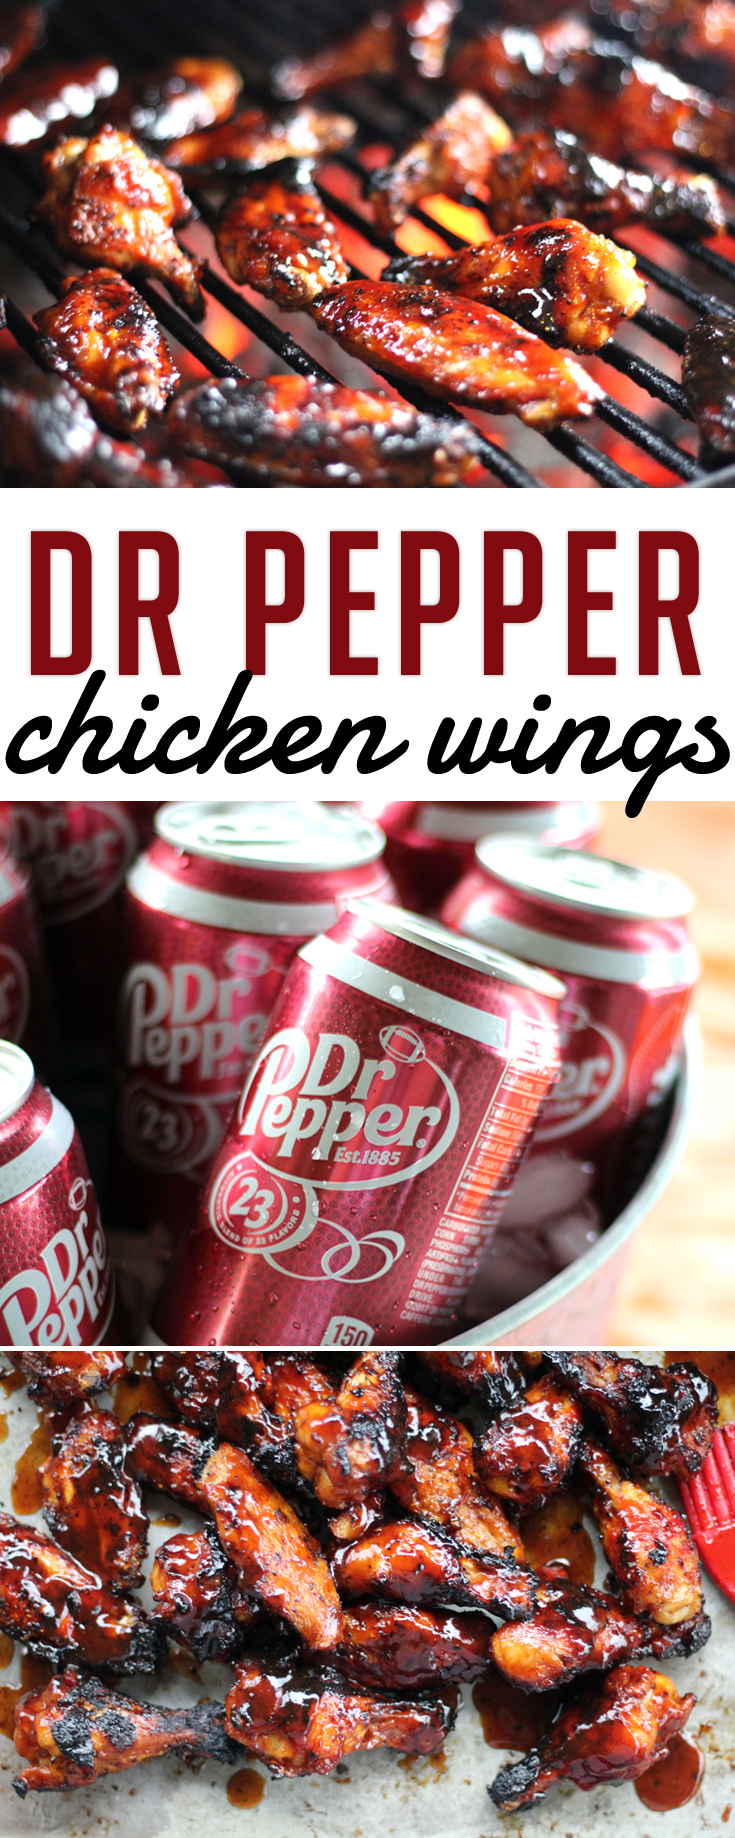 Dr Pepper Chicken Wings